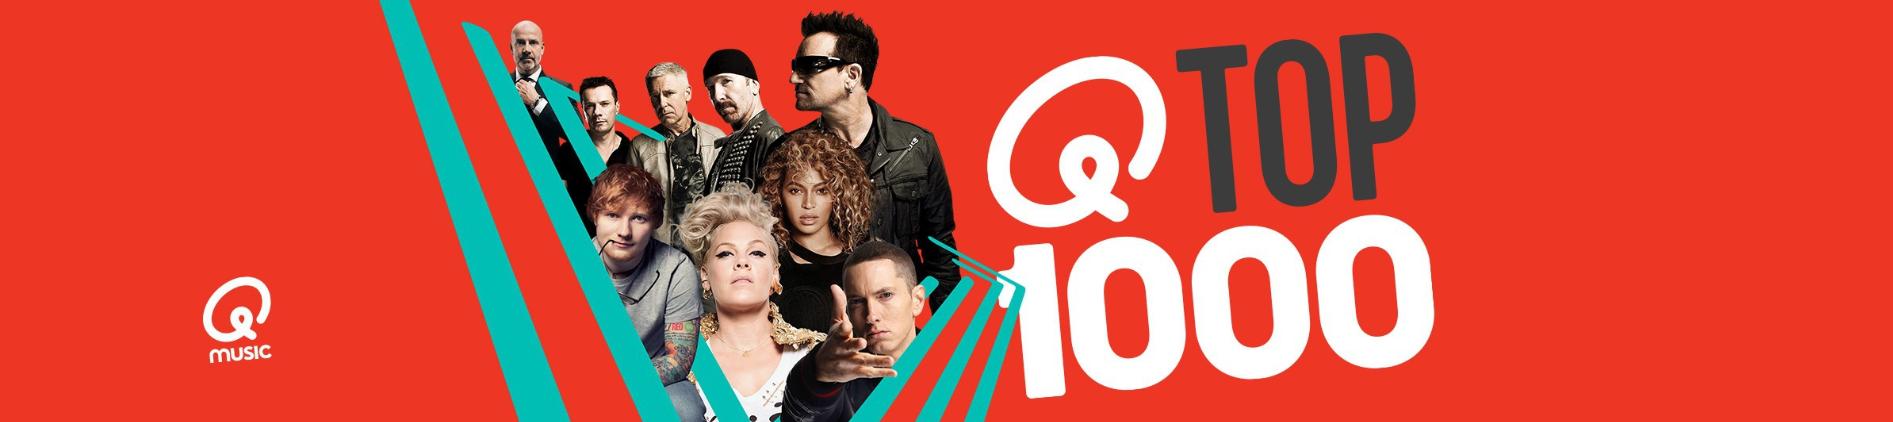 BLØF verzorgt aftrap van Q-top 1000 bij Qmusic